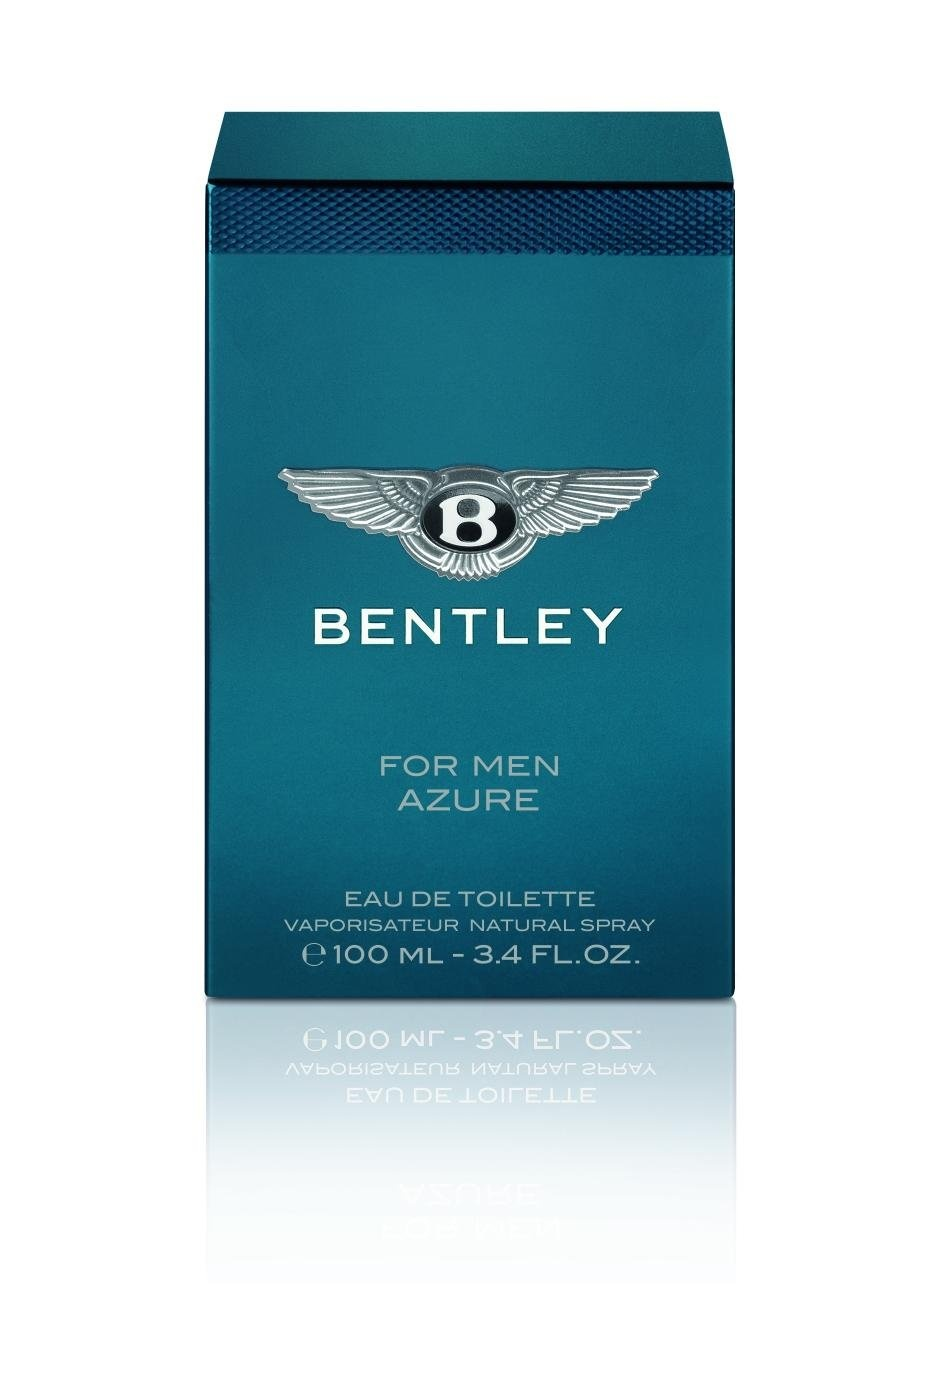 elegance azure men beauty scent luxury fragrance of activist bentley for and the